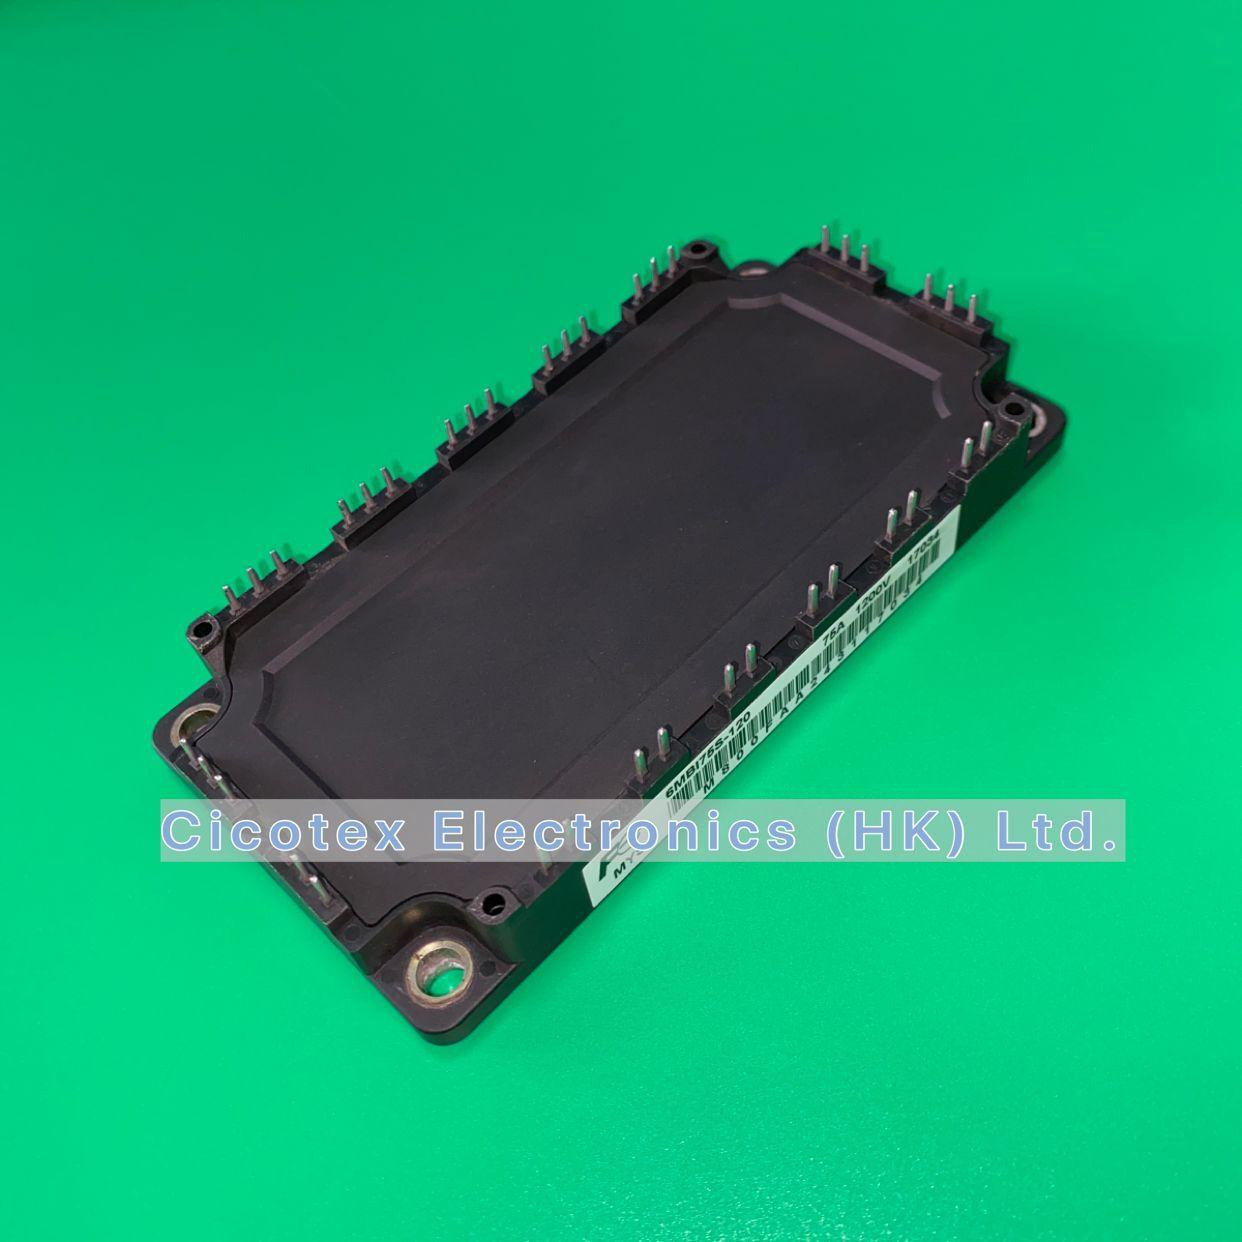 6MBI75S-120 Module 6MBI75 S-120 IGBT 1200V 75A 6MBI75S120 6MBI-75S-120 6MB175S-120